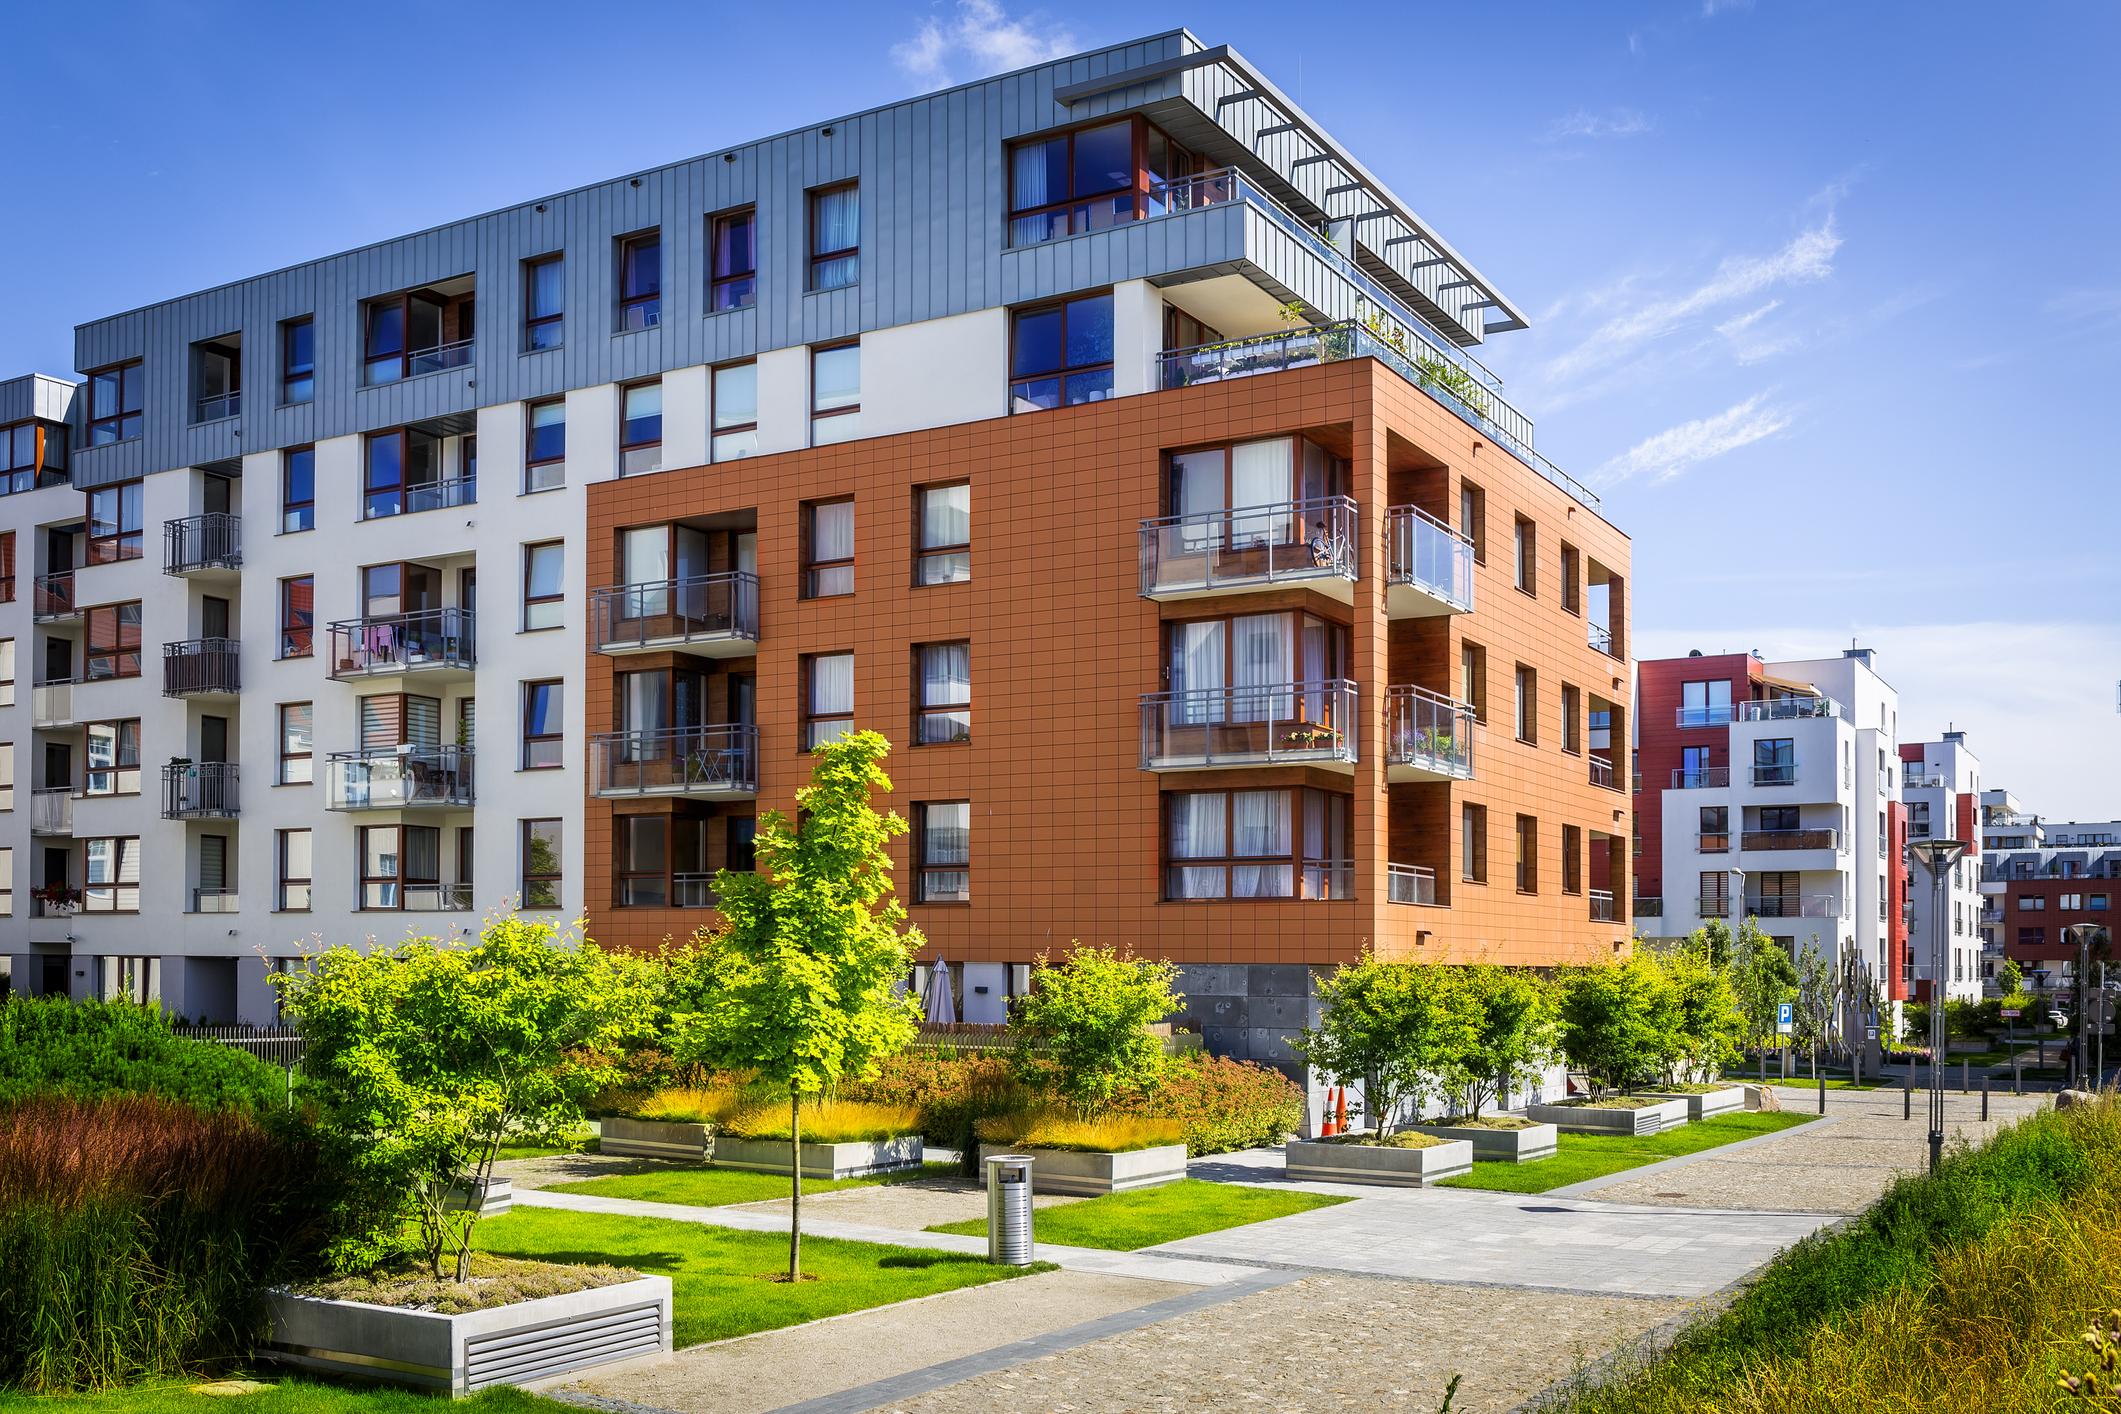 Multi-family - Mixed Use, University Housing